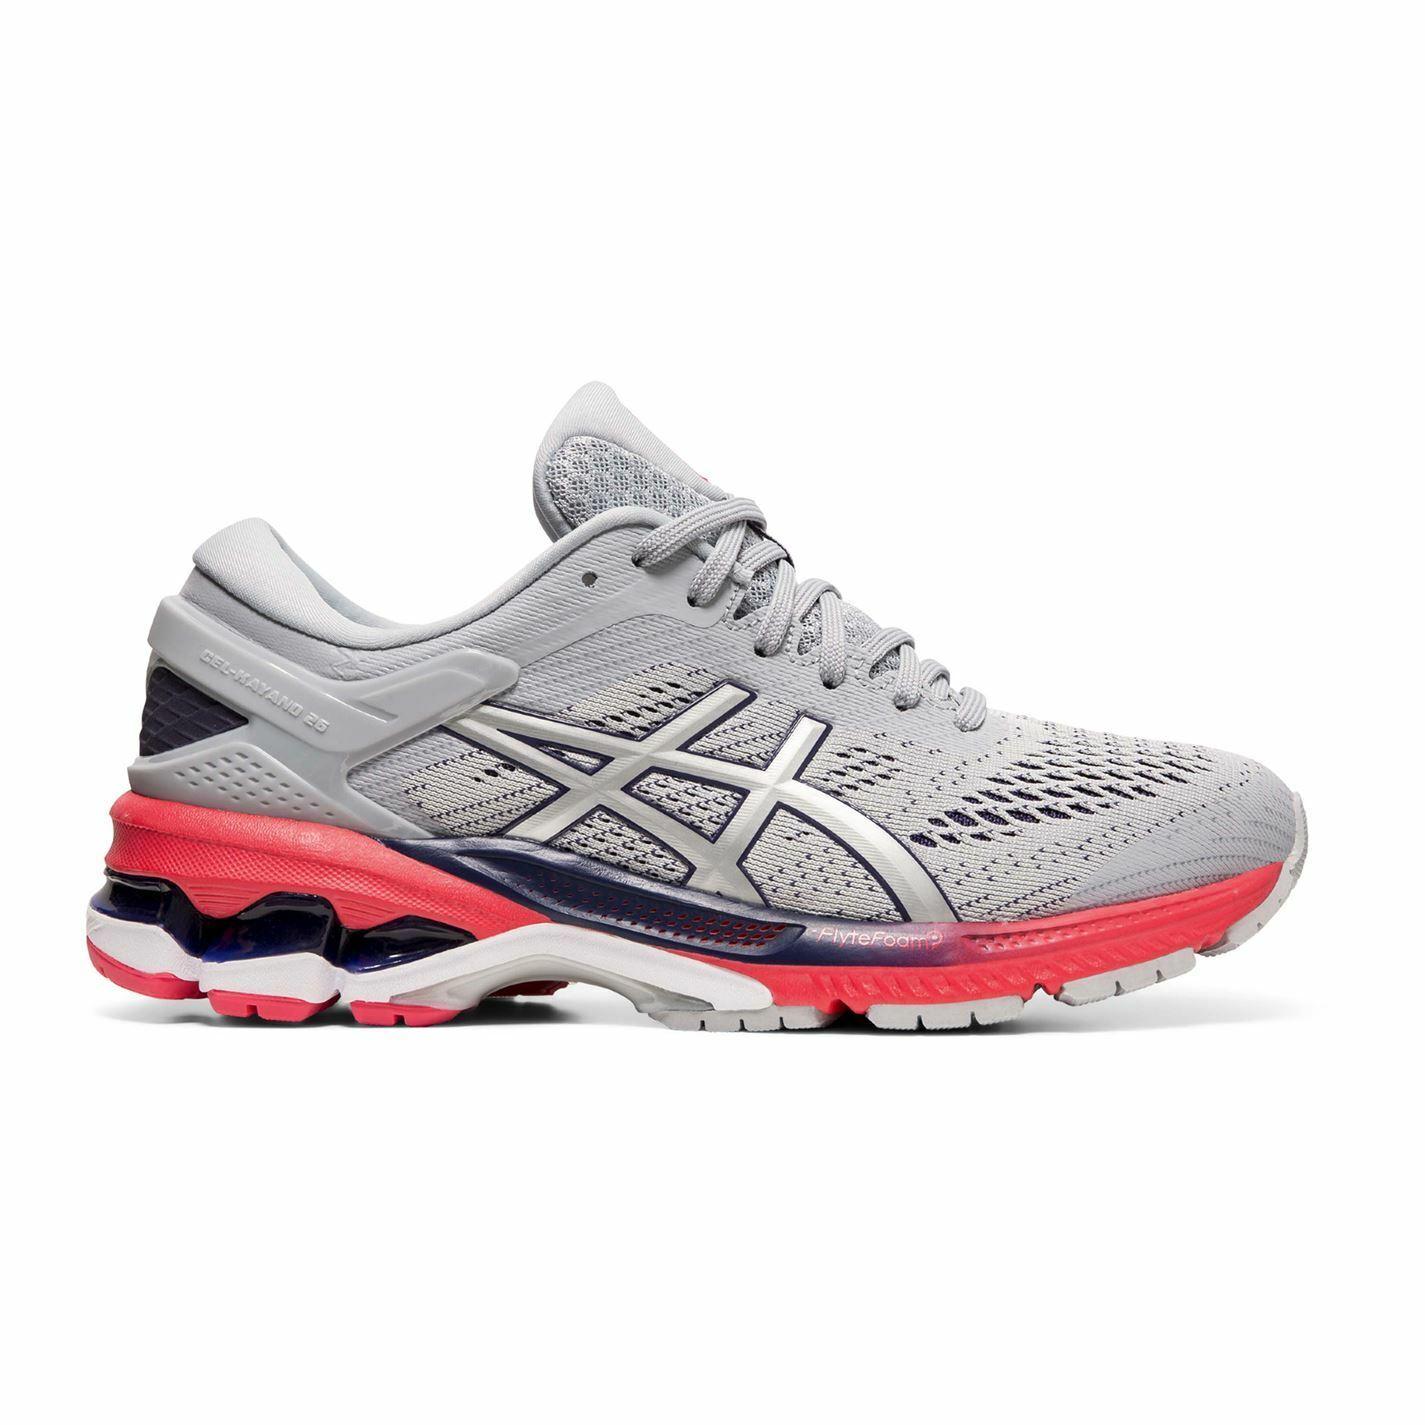 Zapatos Asics Gel Kayano 26 Damas Road Zapatillas